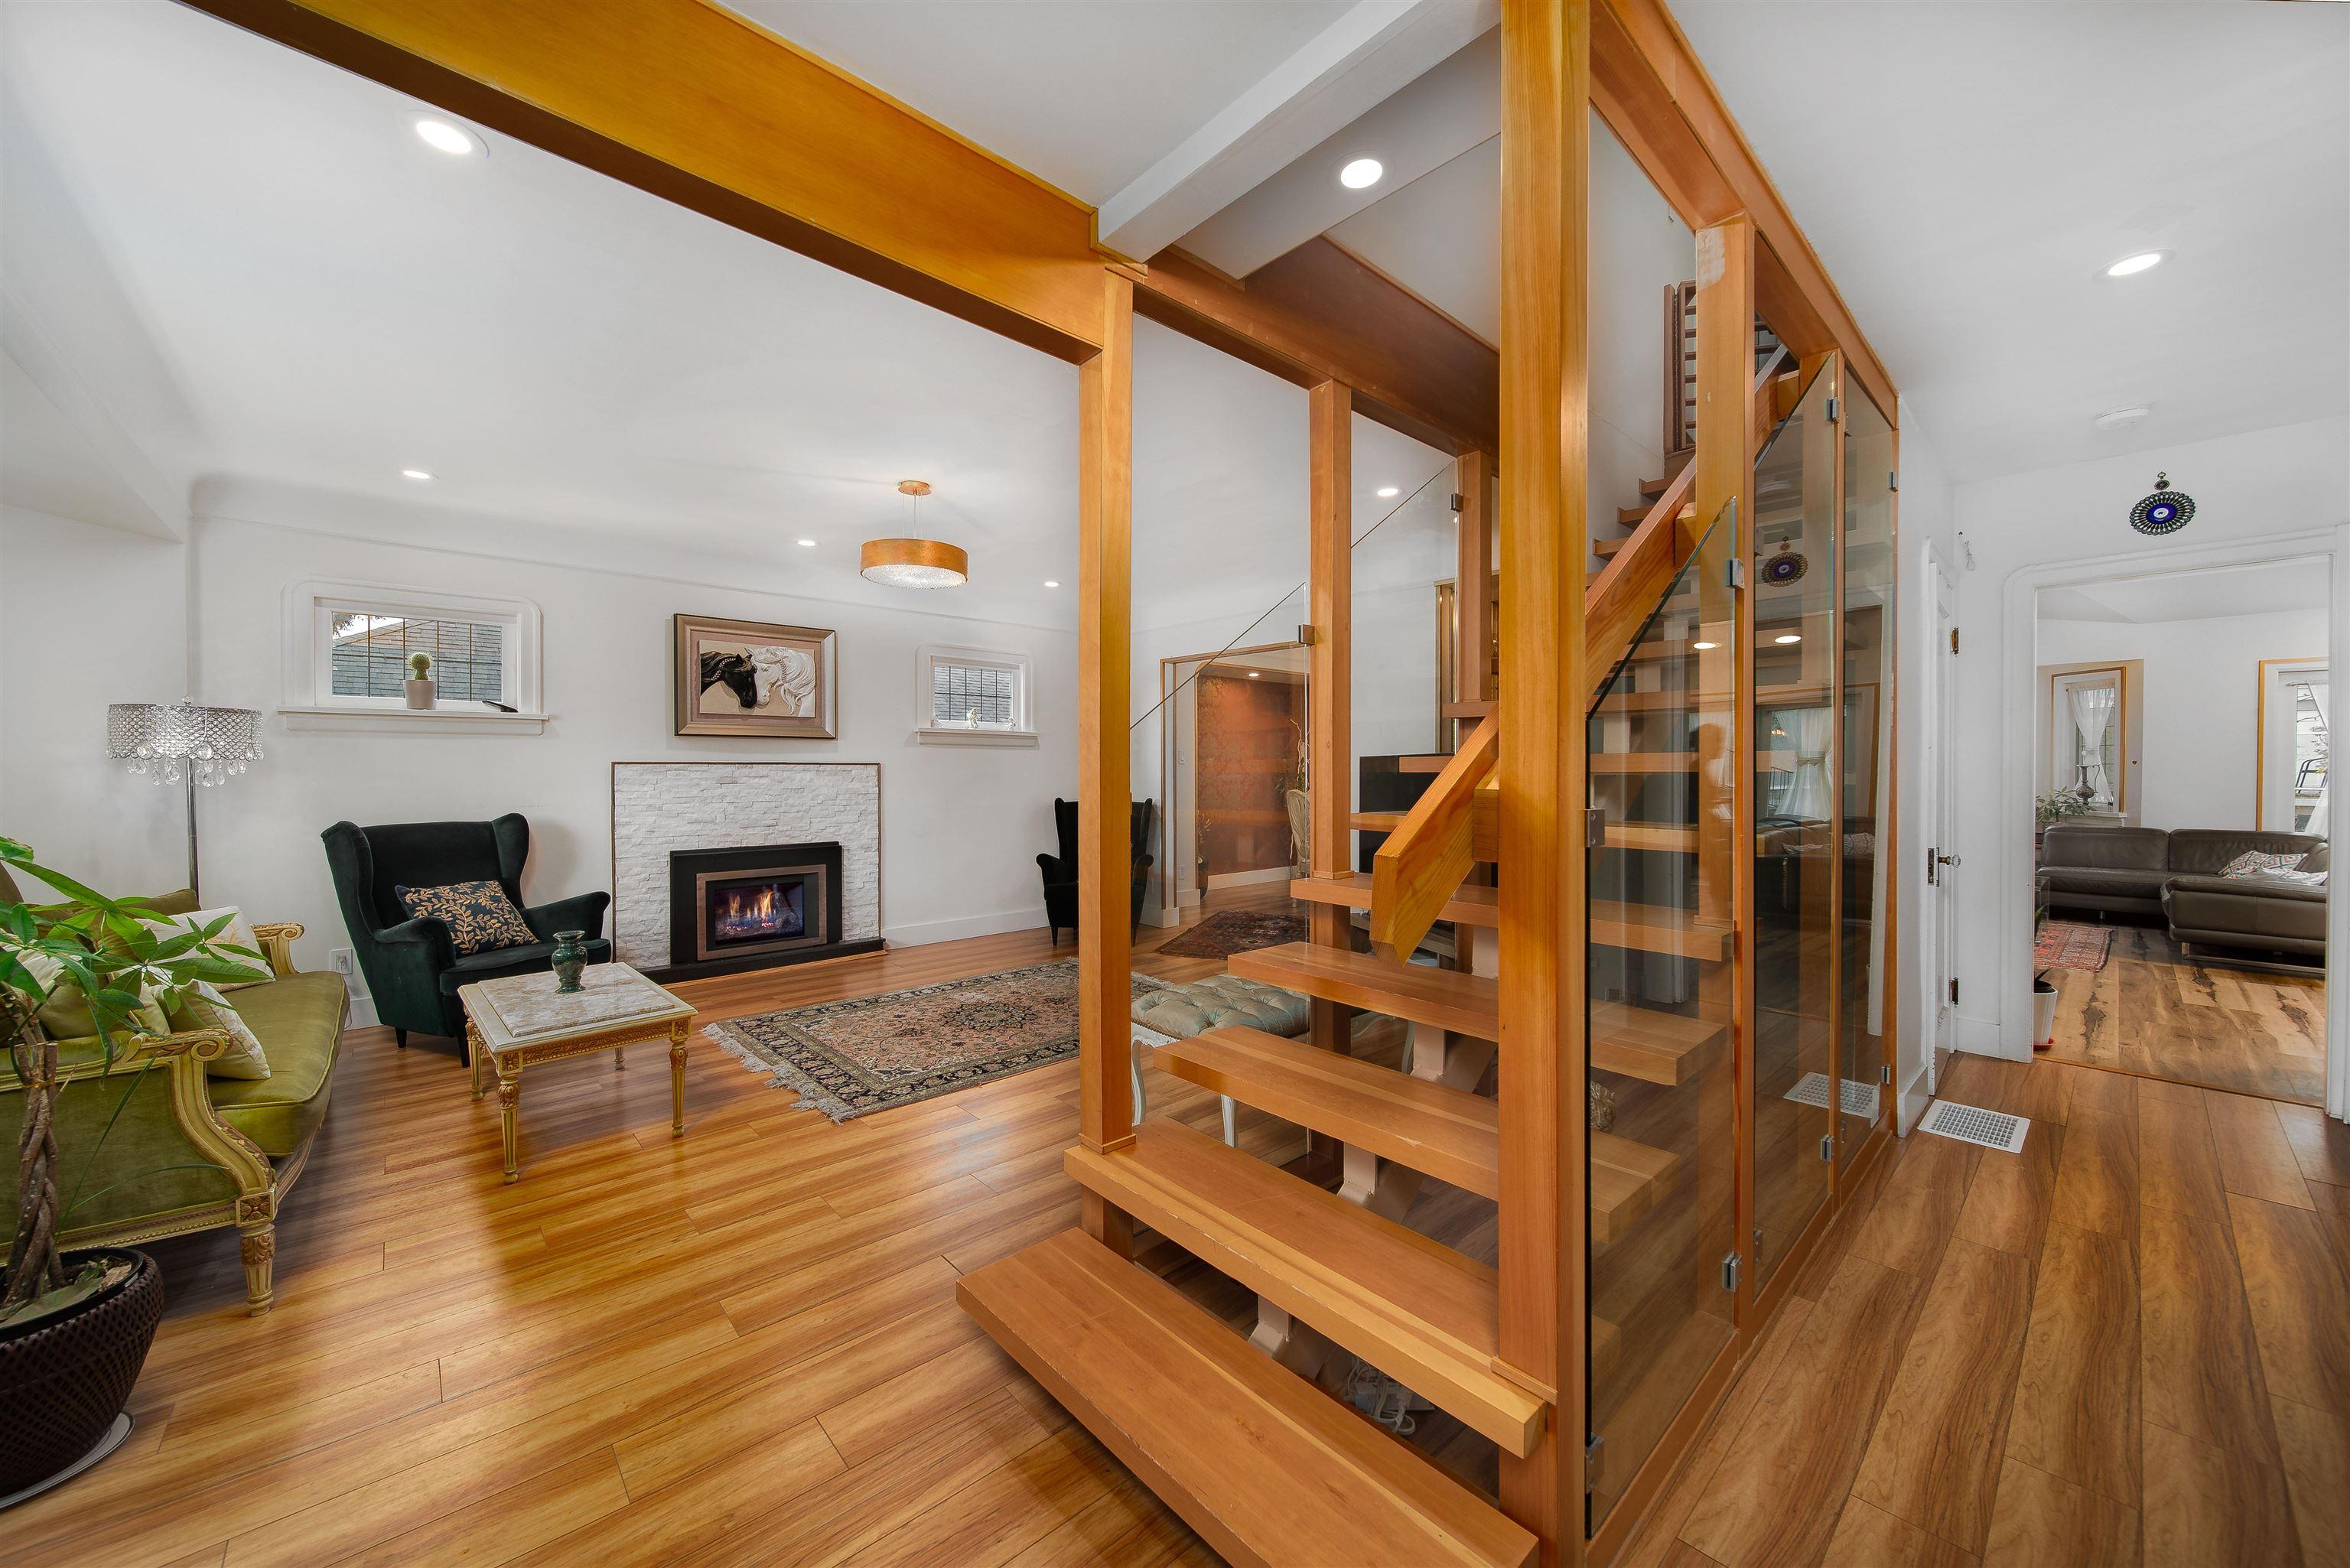 1357 FULTON AVENUE - Ambleside House/Single Family for sale, 6 Bedrooms (R2617731) - #7